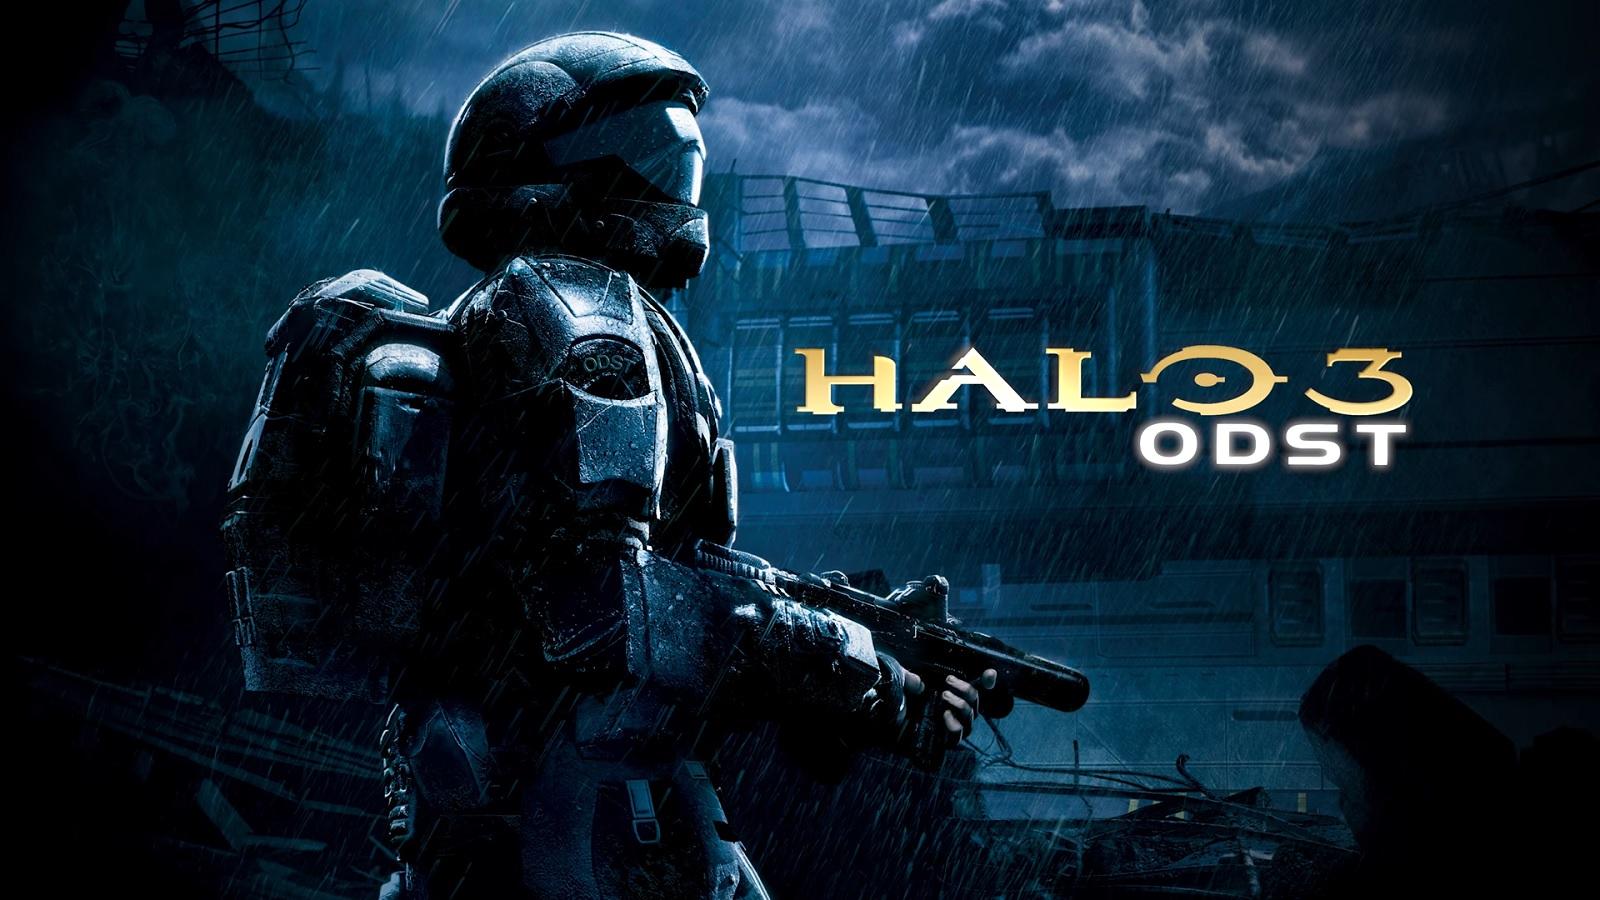 Halo 3: ODST выходит на ПК 22 сентября